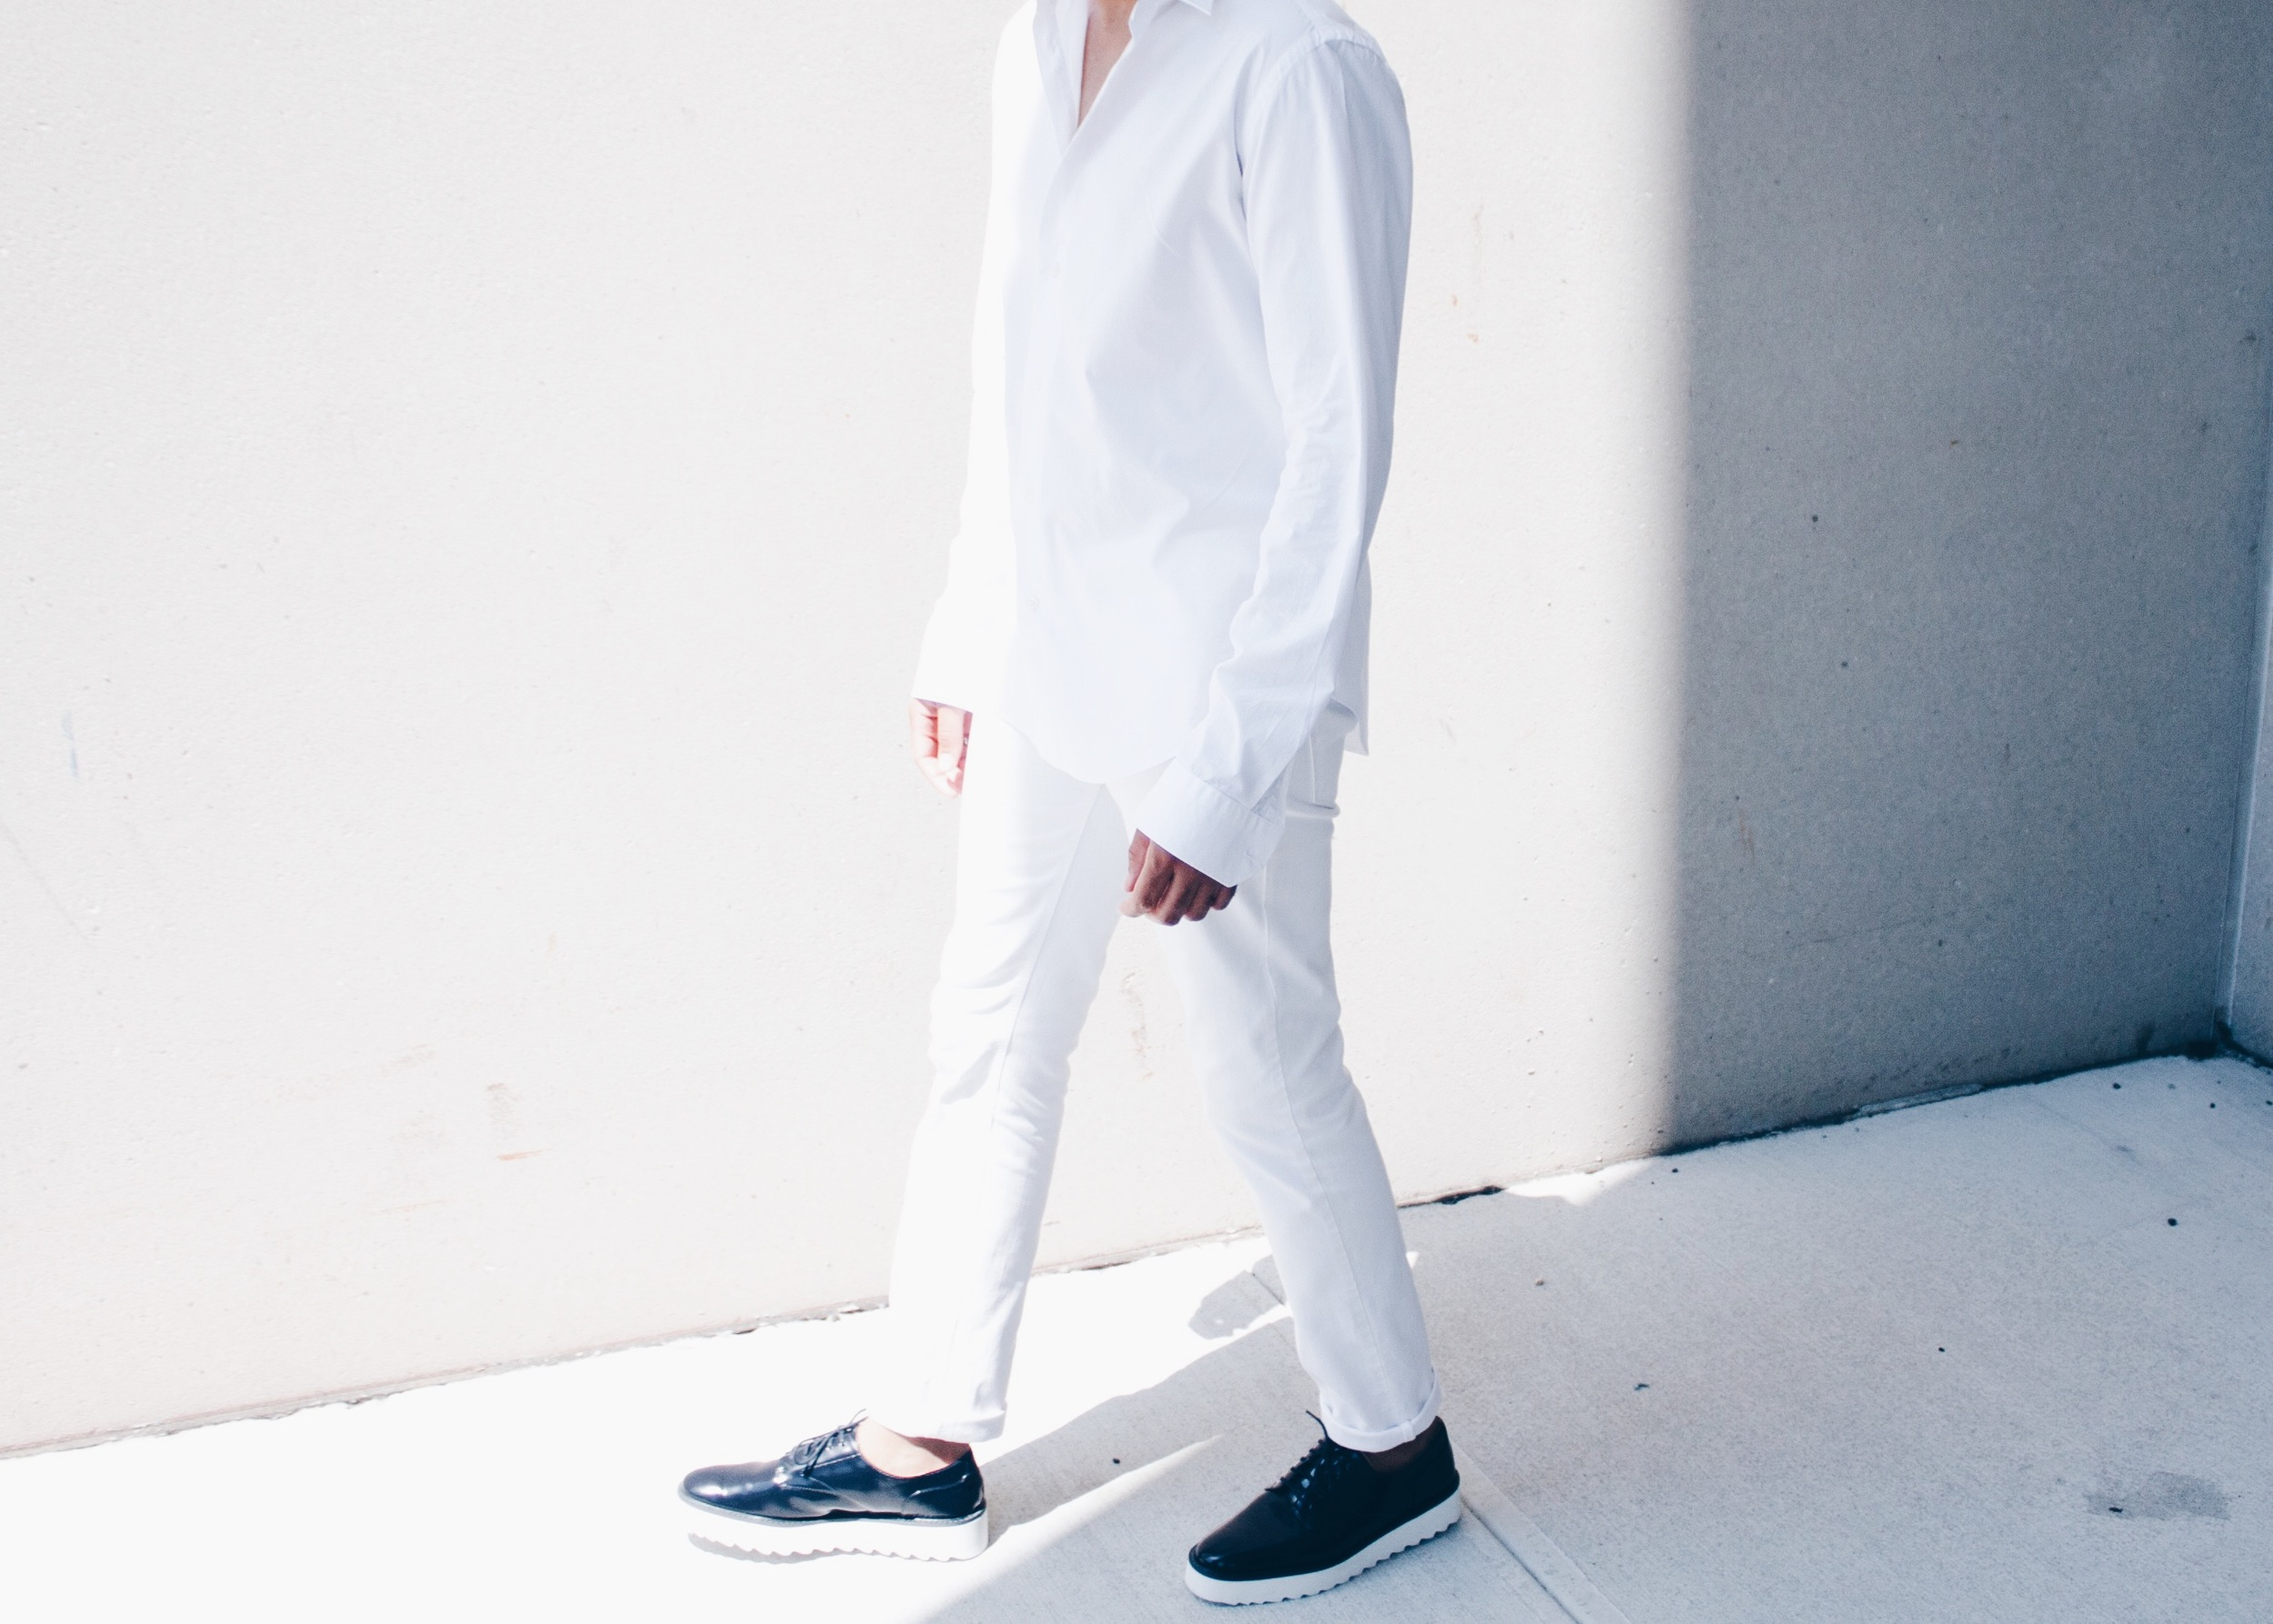 sam-c-perry-all-white-navy-creepers-walk.jpg